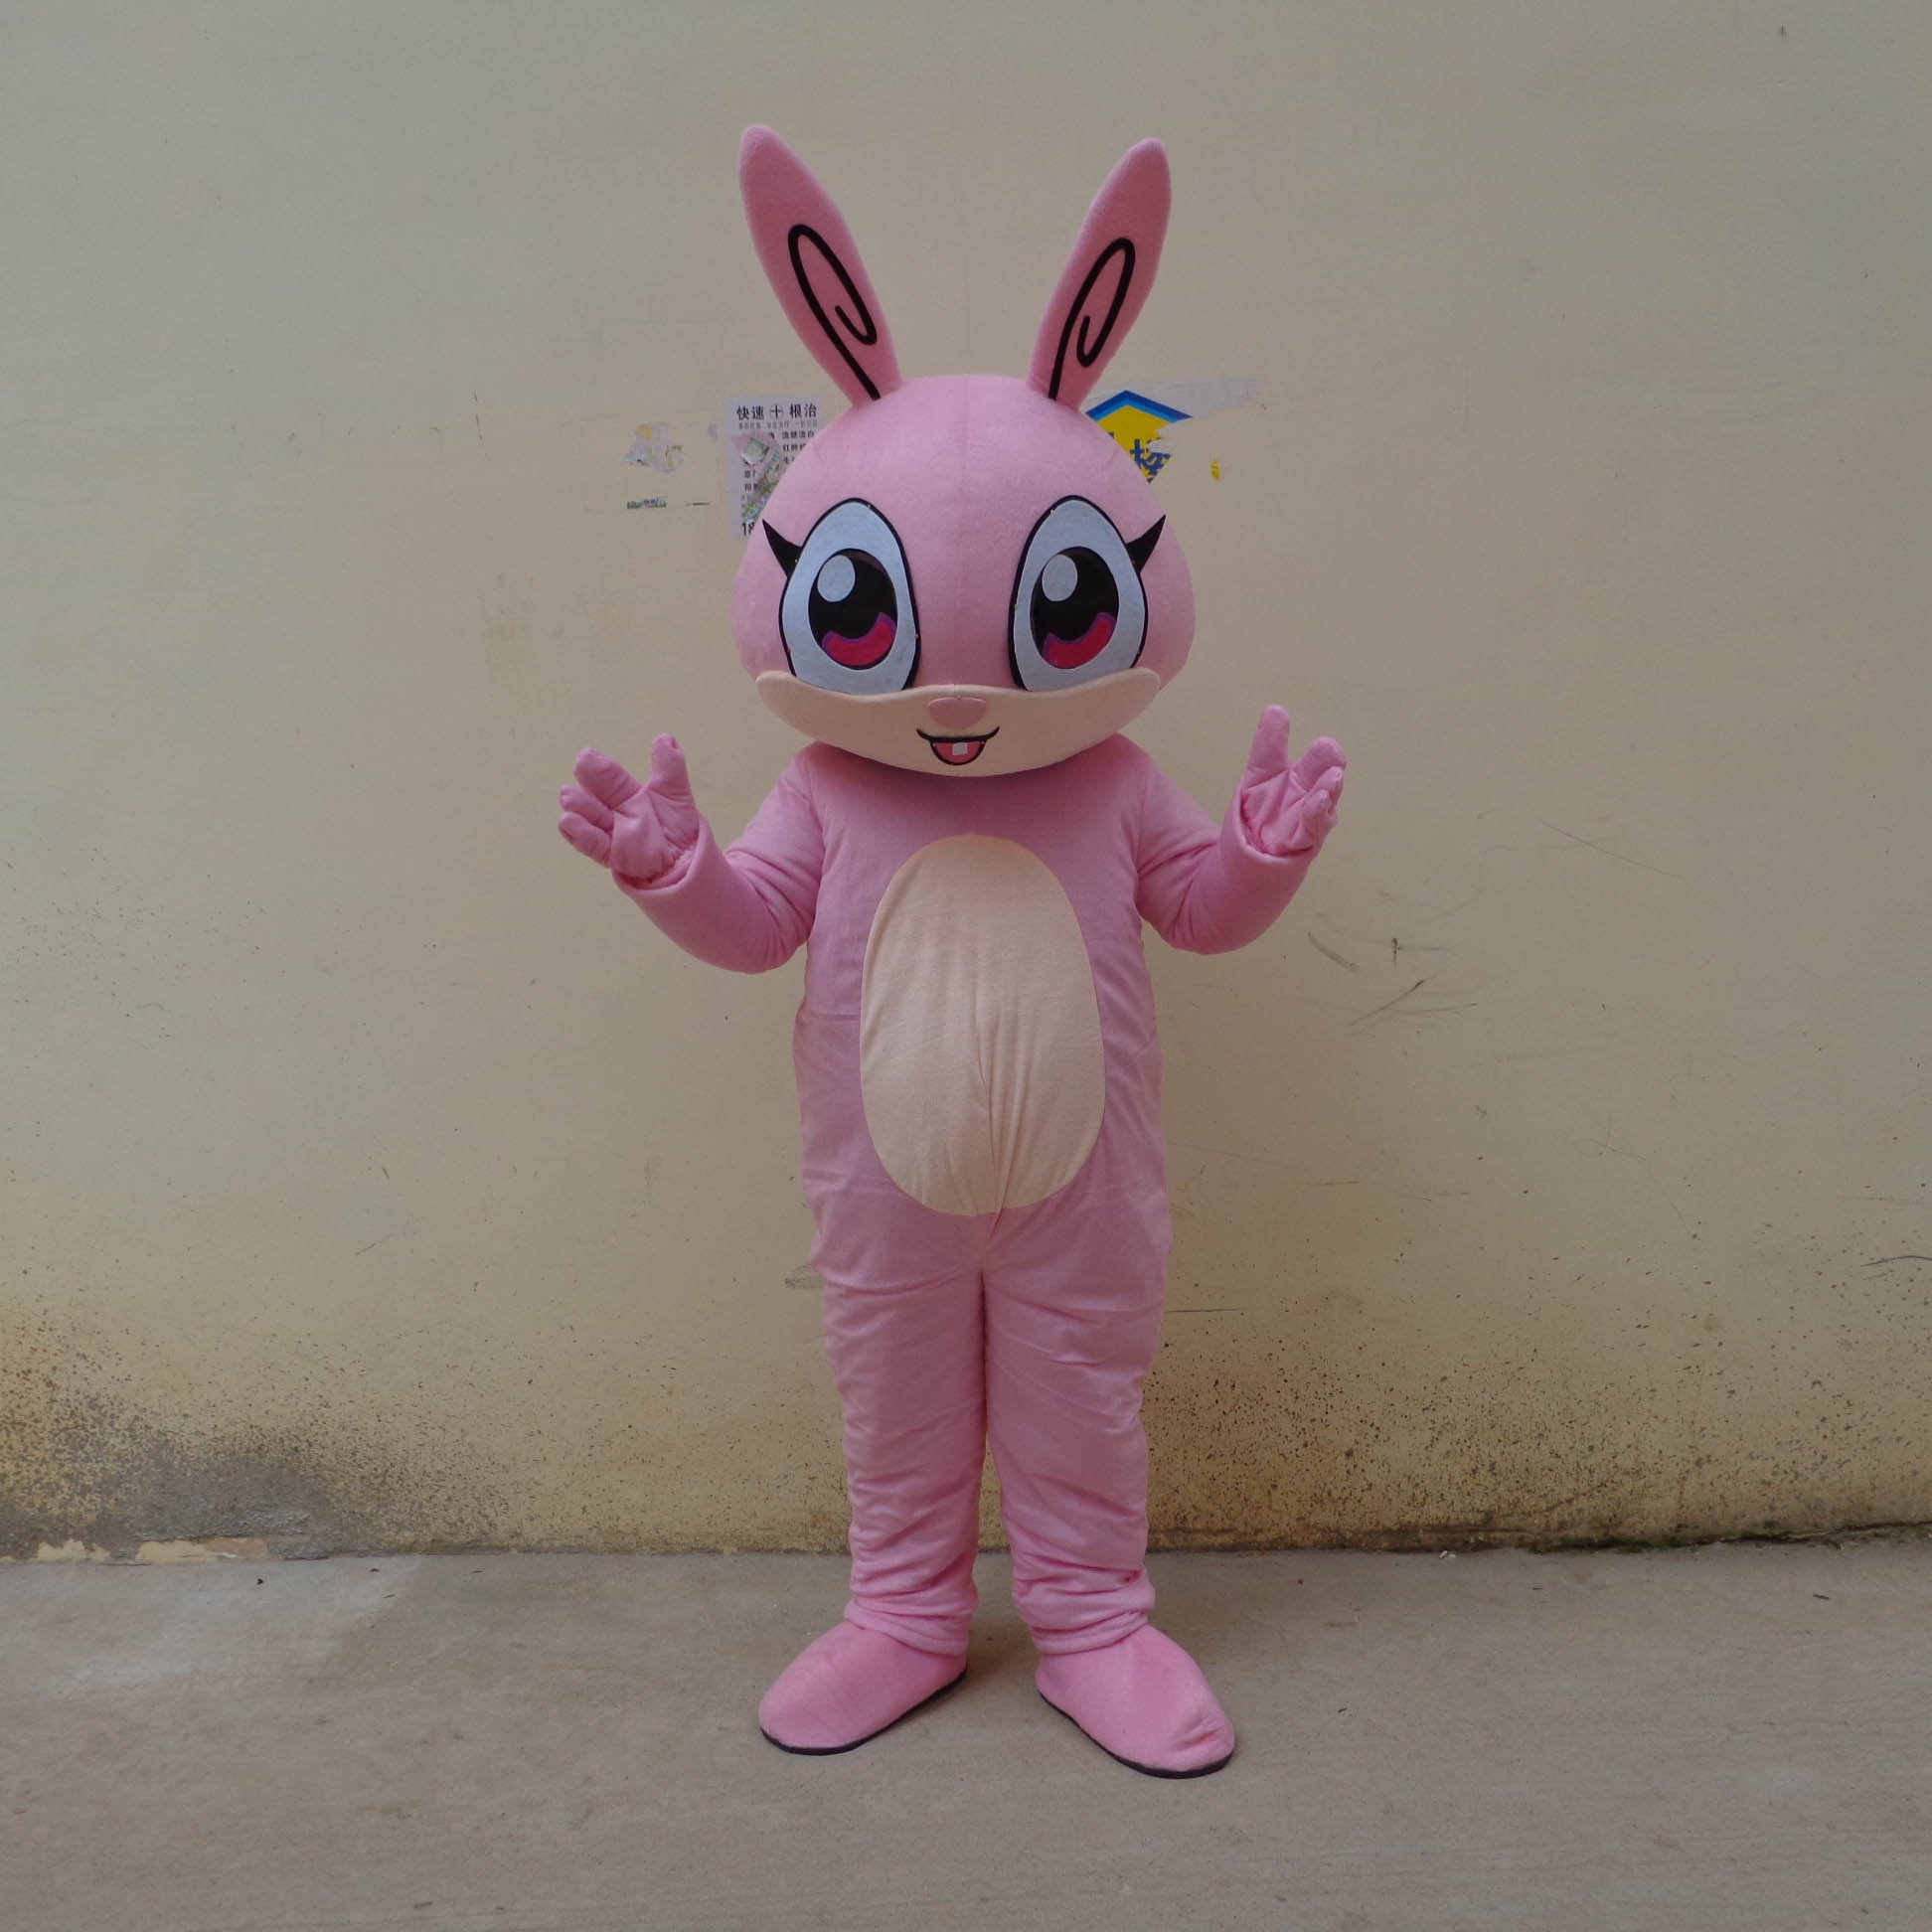 Cute Little Bunny Cartoon Doll Clothing Cartoon Walking Doll Clothing Cartoon Show Clothing Plush Toys Mascot Costume